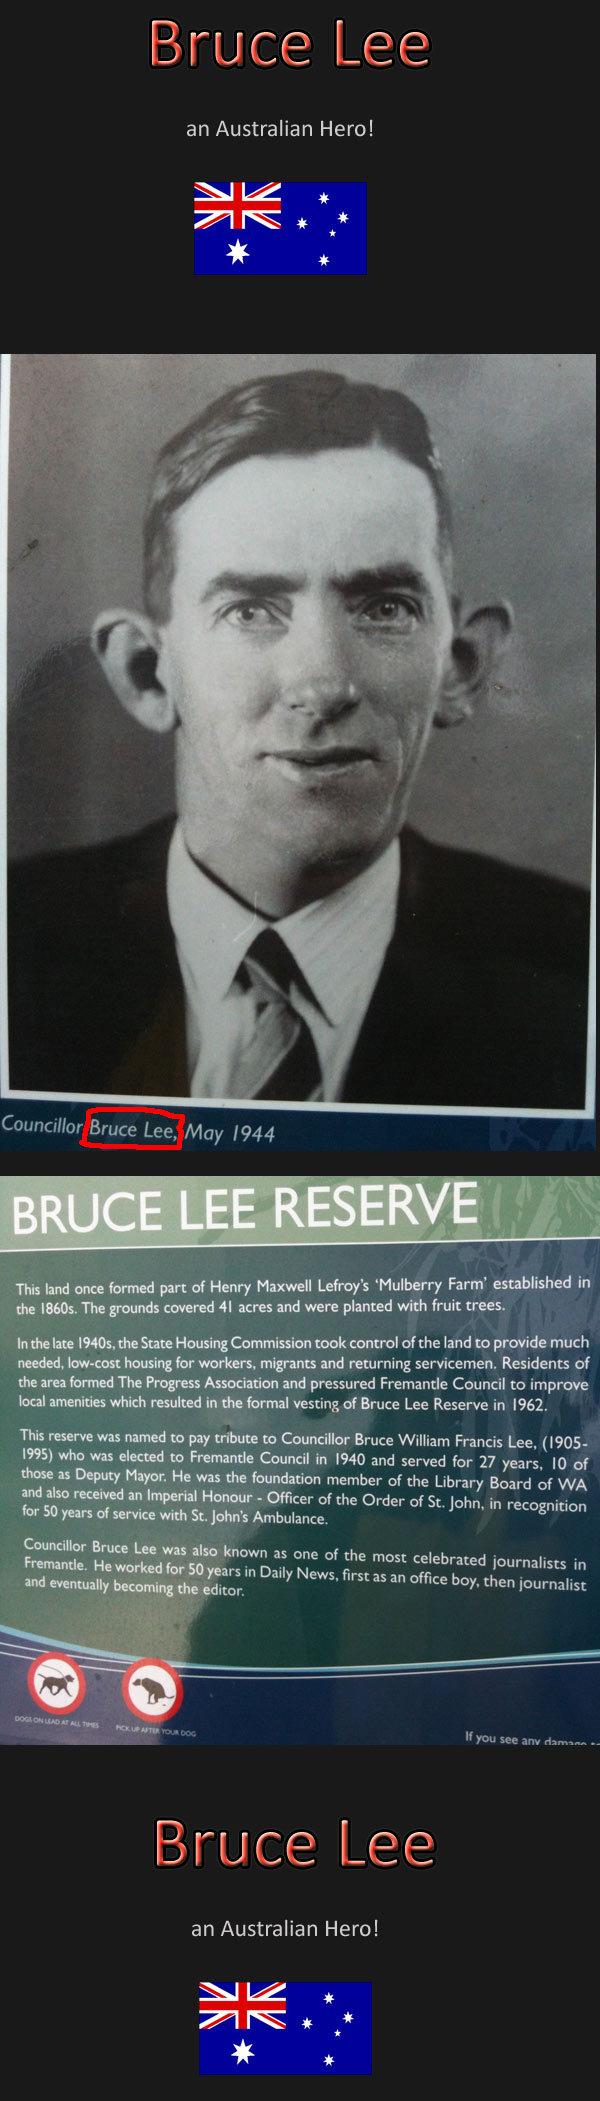 Bruce Lee of Australia. Australia, red Land of opportunity and Snake, Spider & Shark. an Australian Hera! hid part at Henry Maxwell Jeffroy' s ' harm' estab bruce lee australia